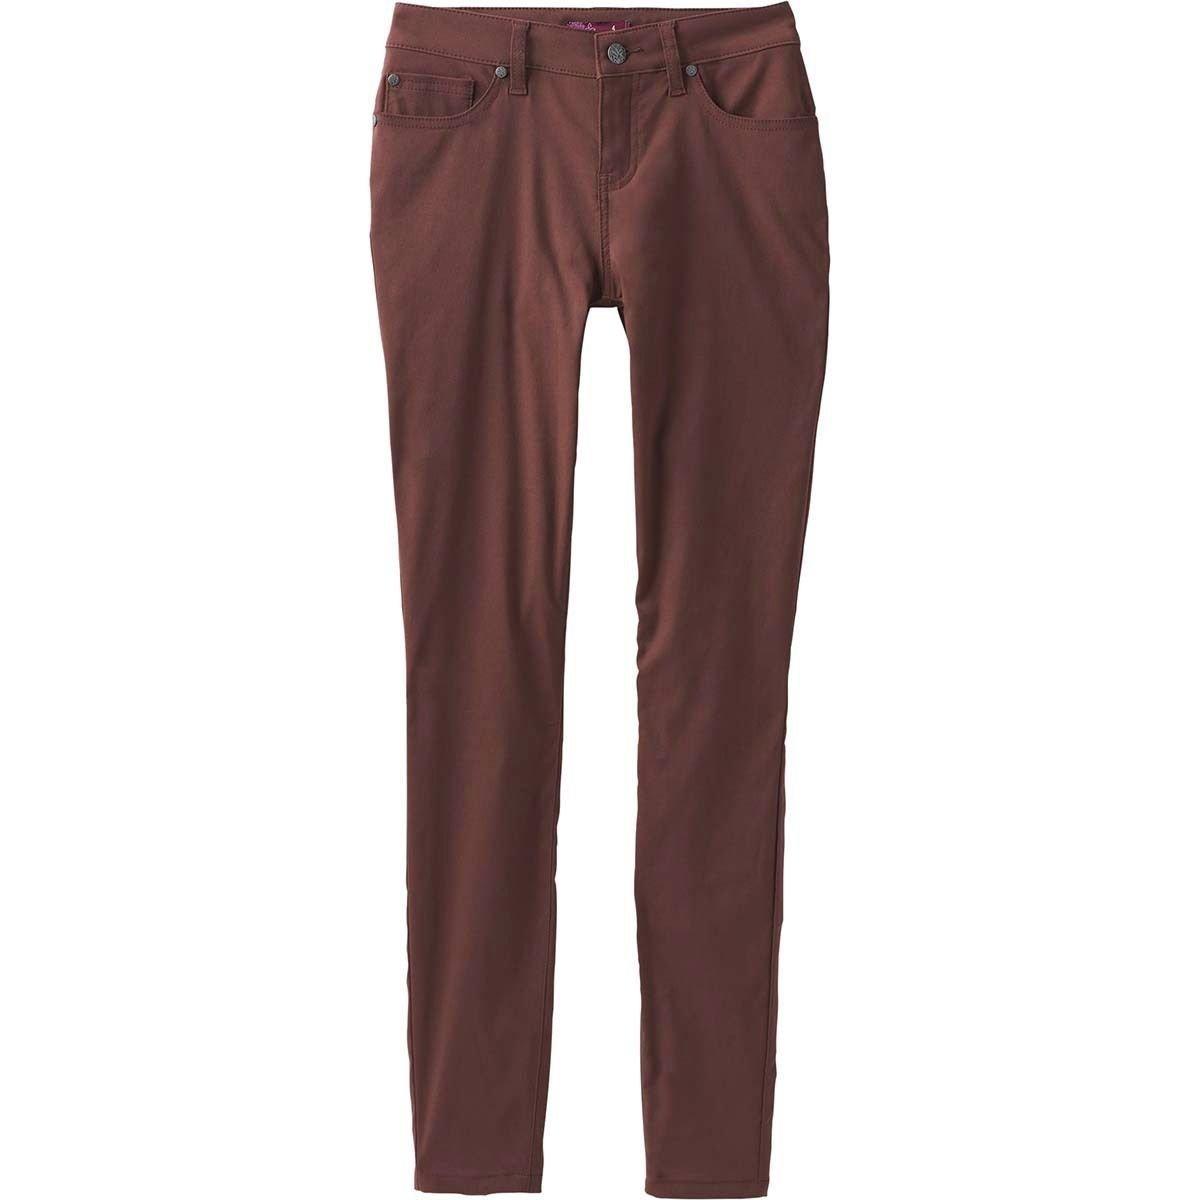 prAna Women's Regular Inseam Briann Pants, 6, Wedge Wood